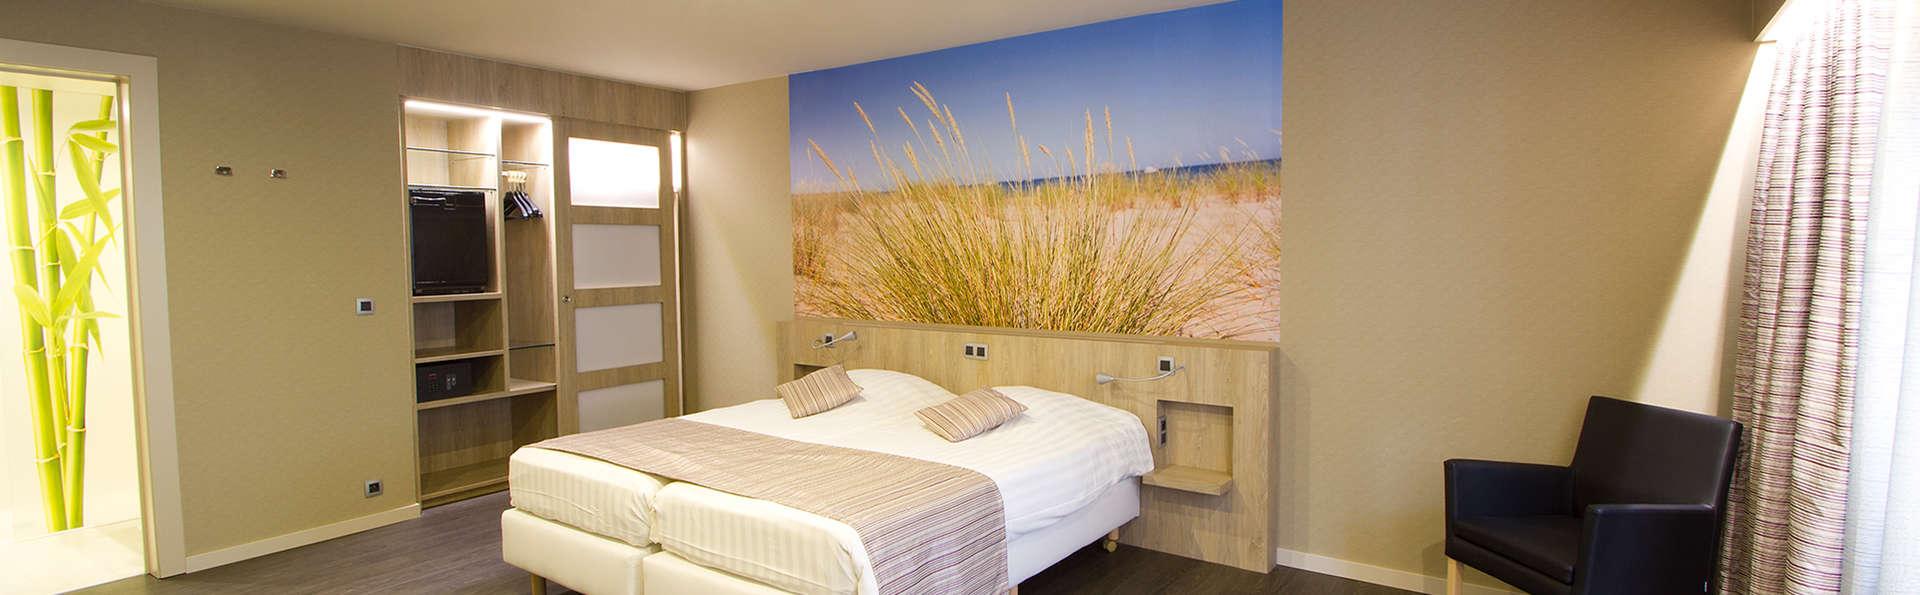 Hotel Bero - EDIT_NEW_Ecology2.jpg